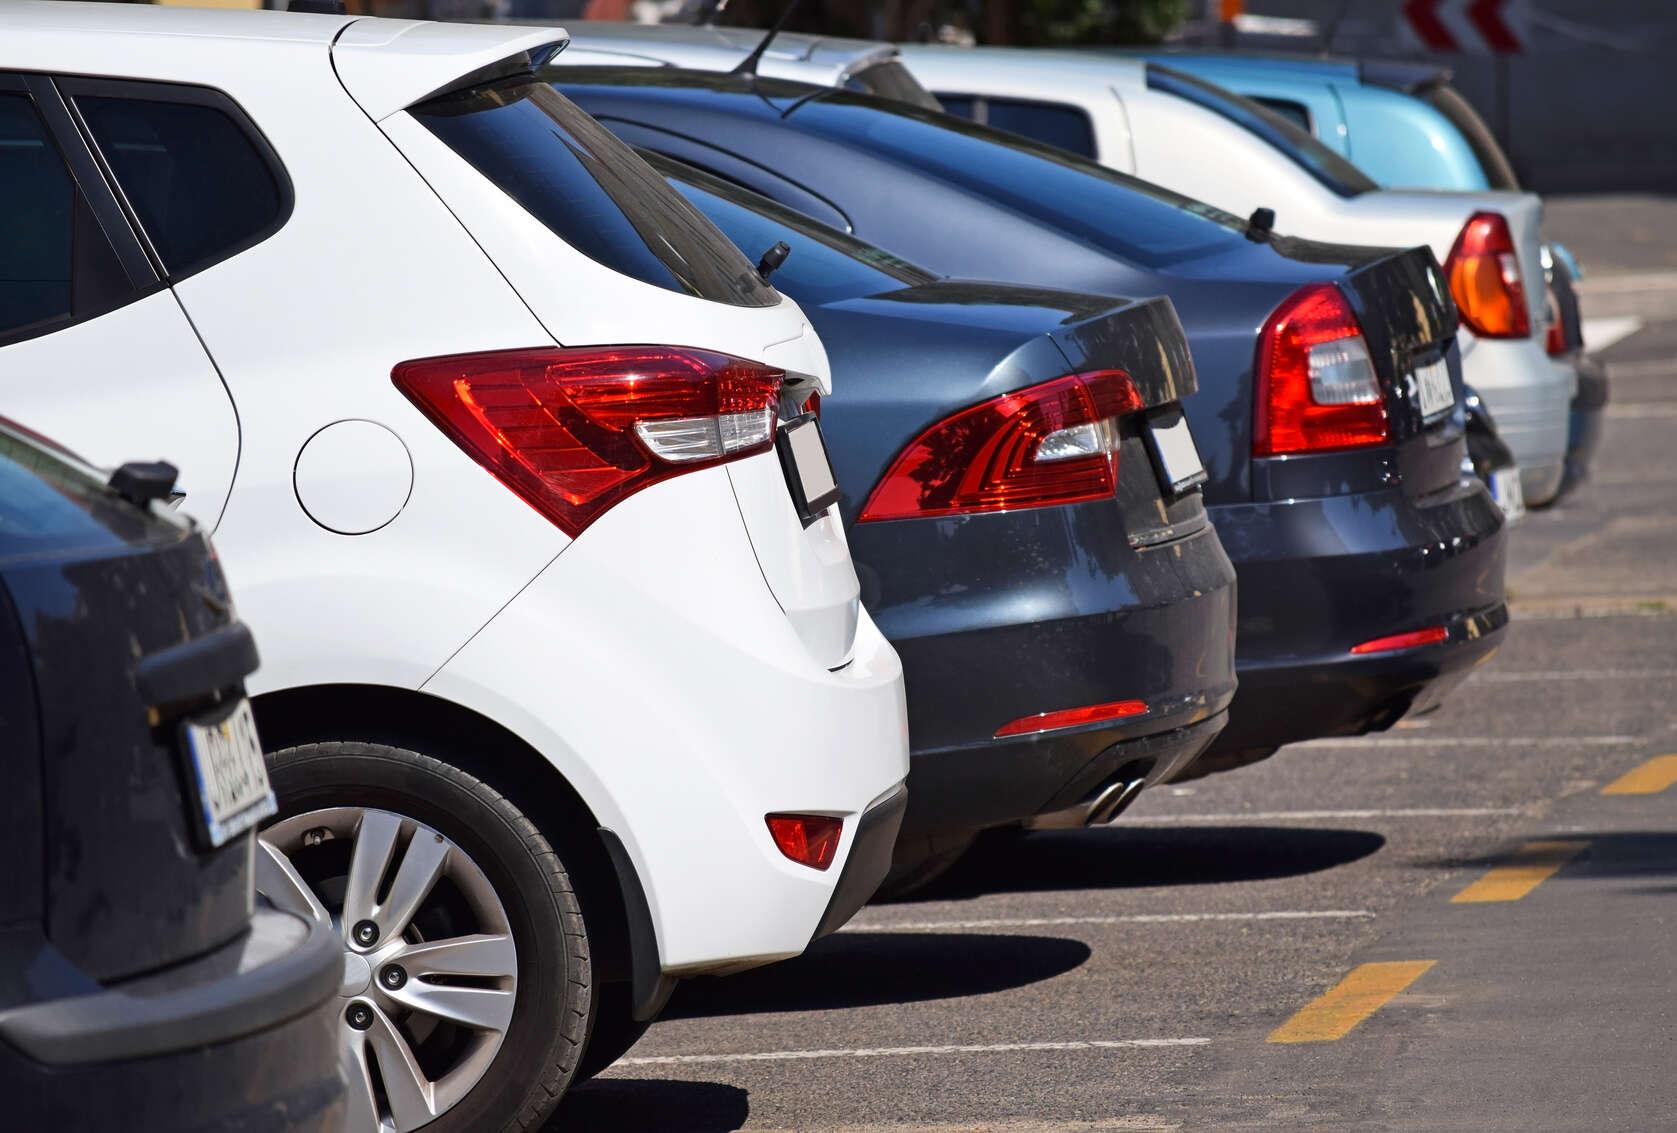 VLF fee reduction for Enterprise/National Car Rental in Alberta starting April 1, 2016